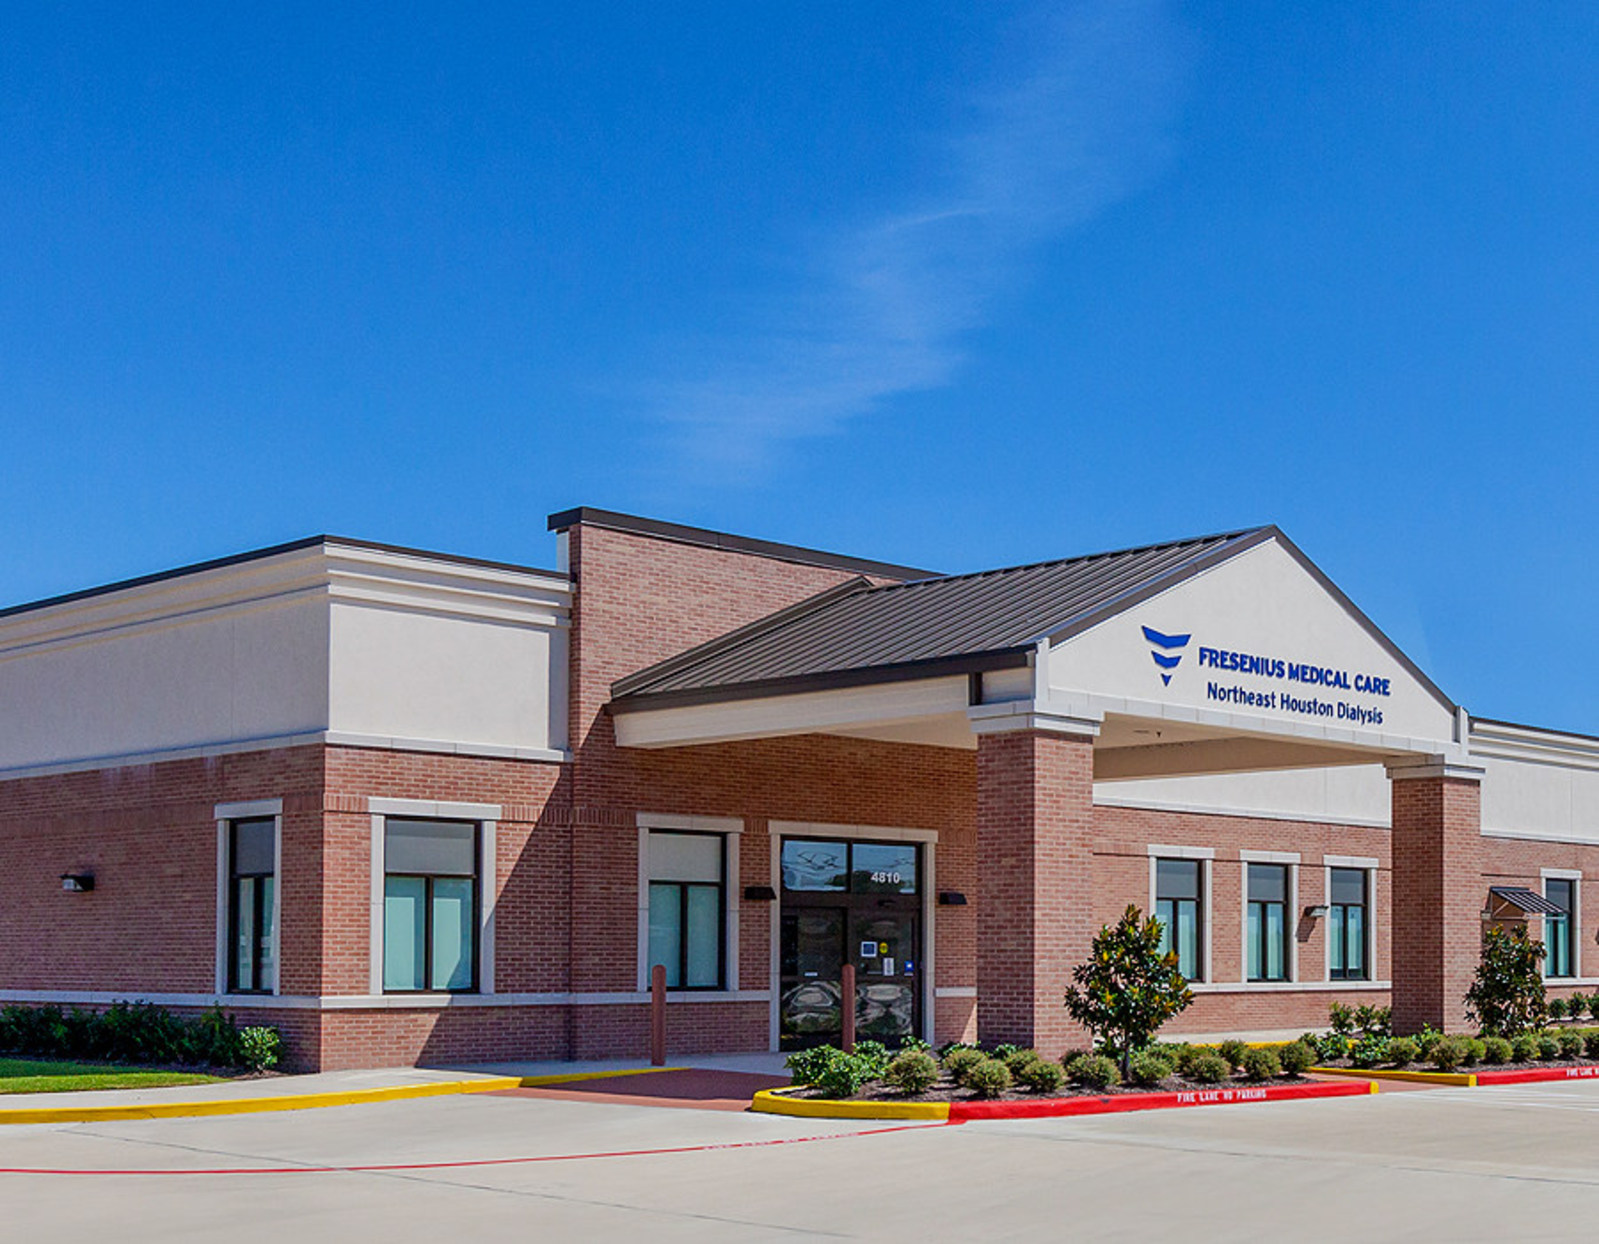 Fresenius Medical Care, North Houston, Texas